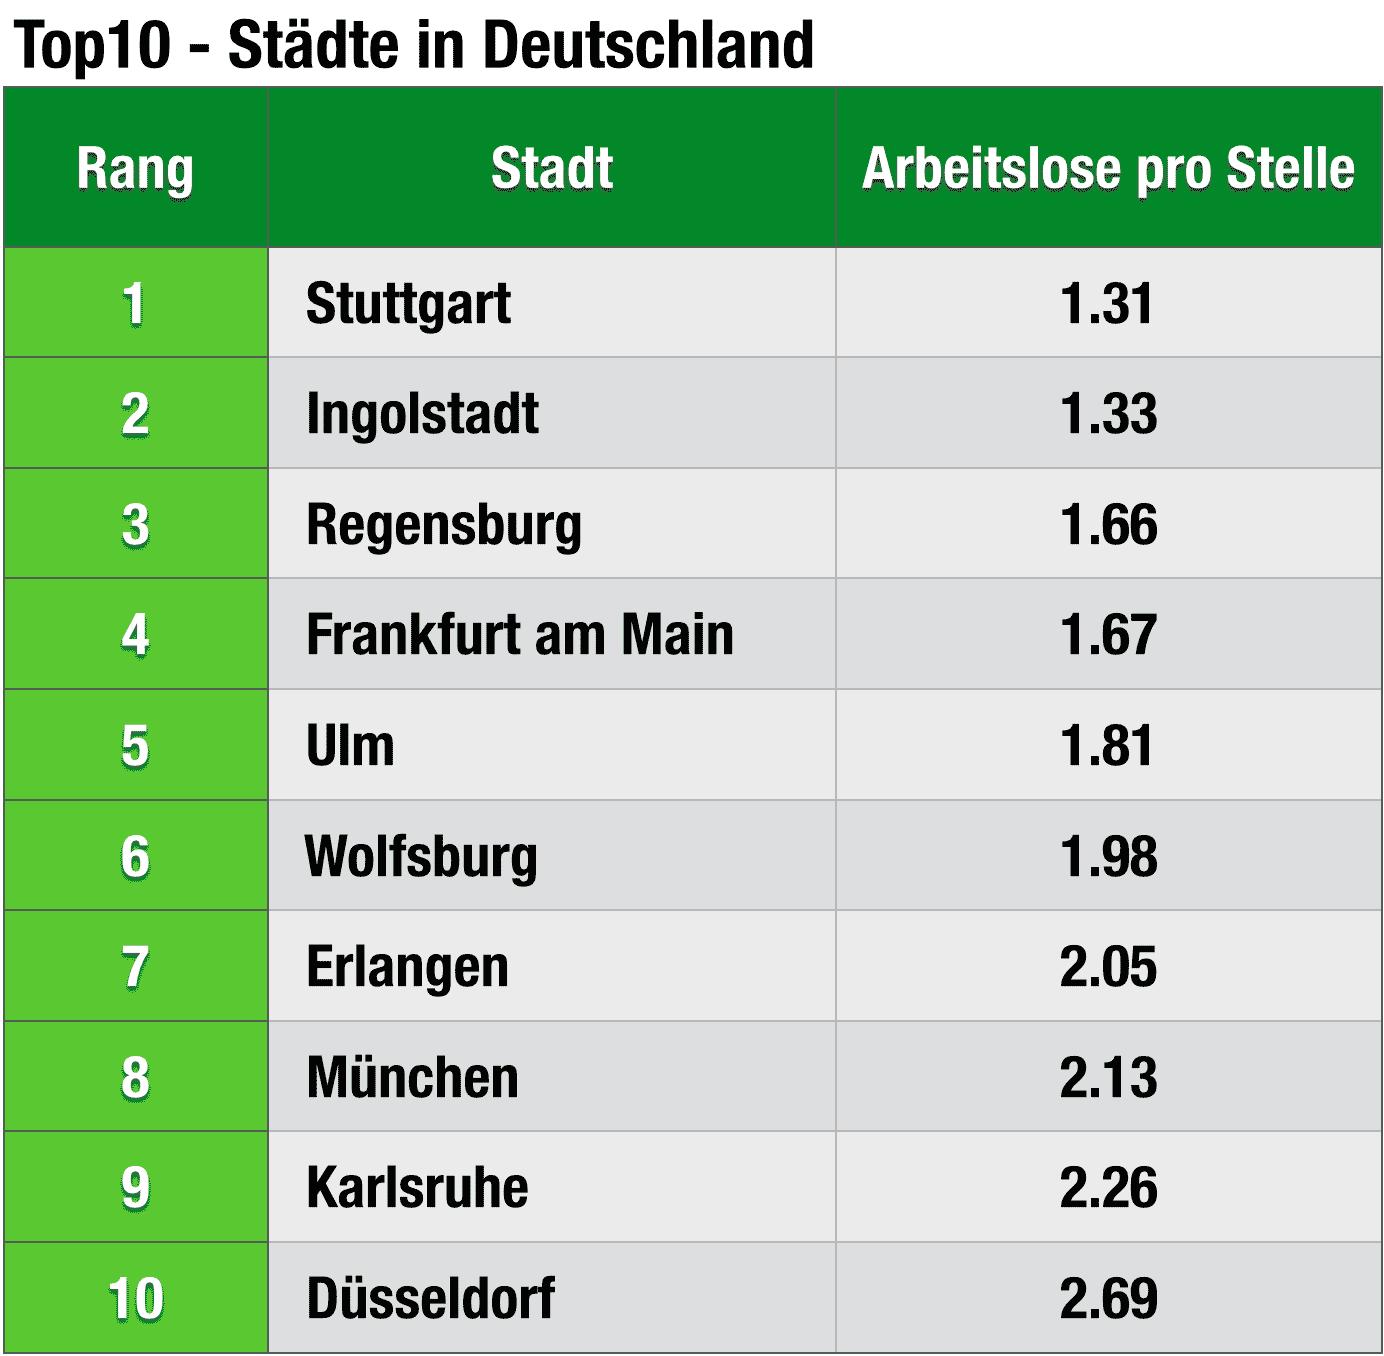 Arbeitslosenquote Karlsruhe